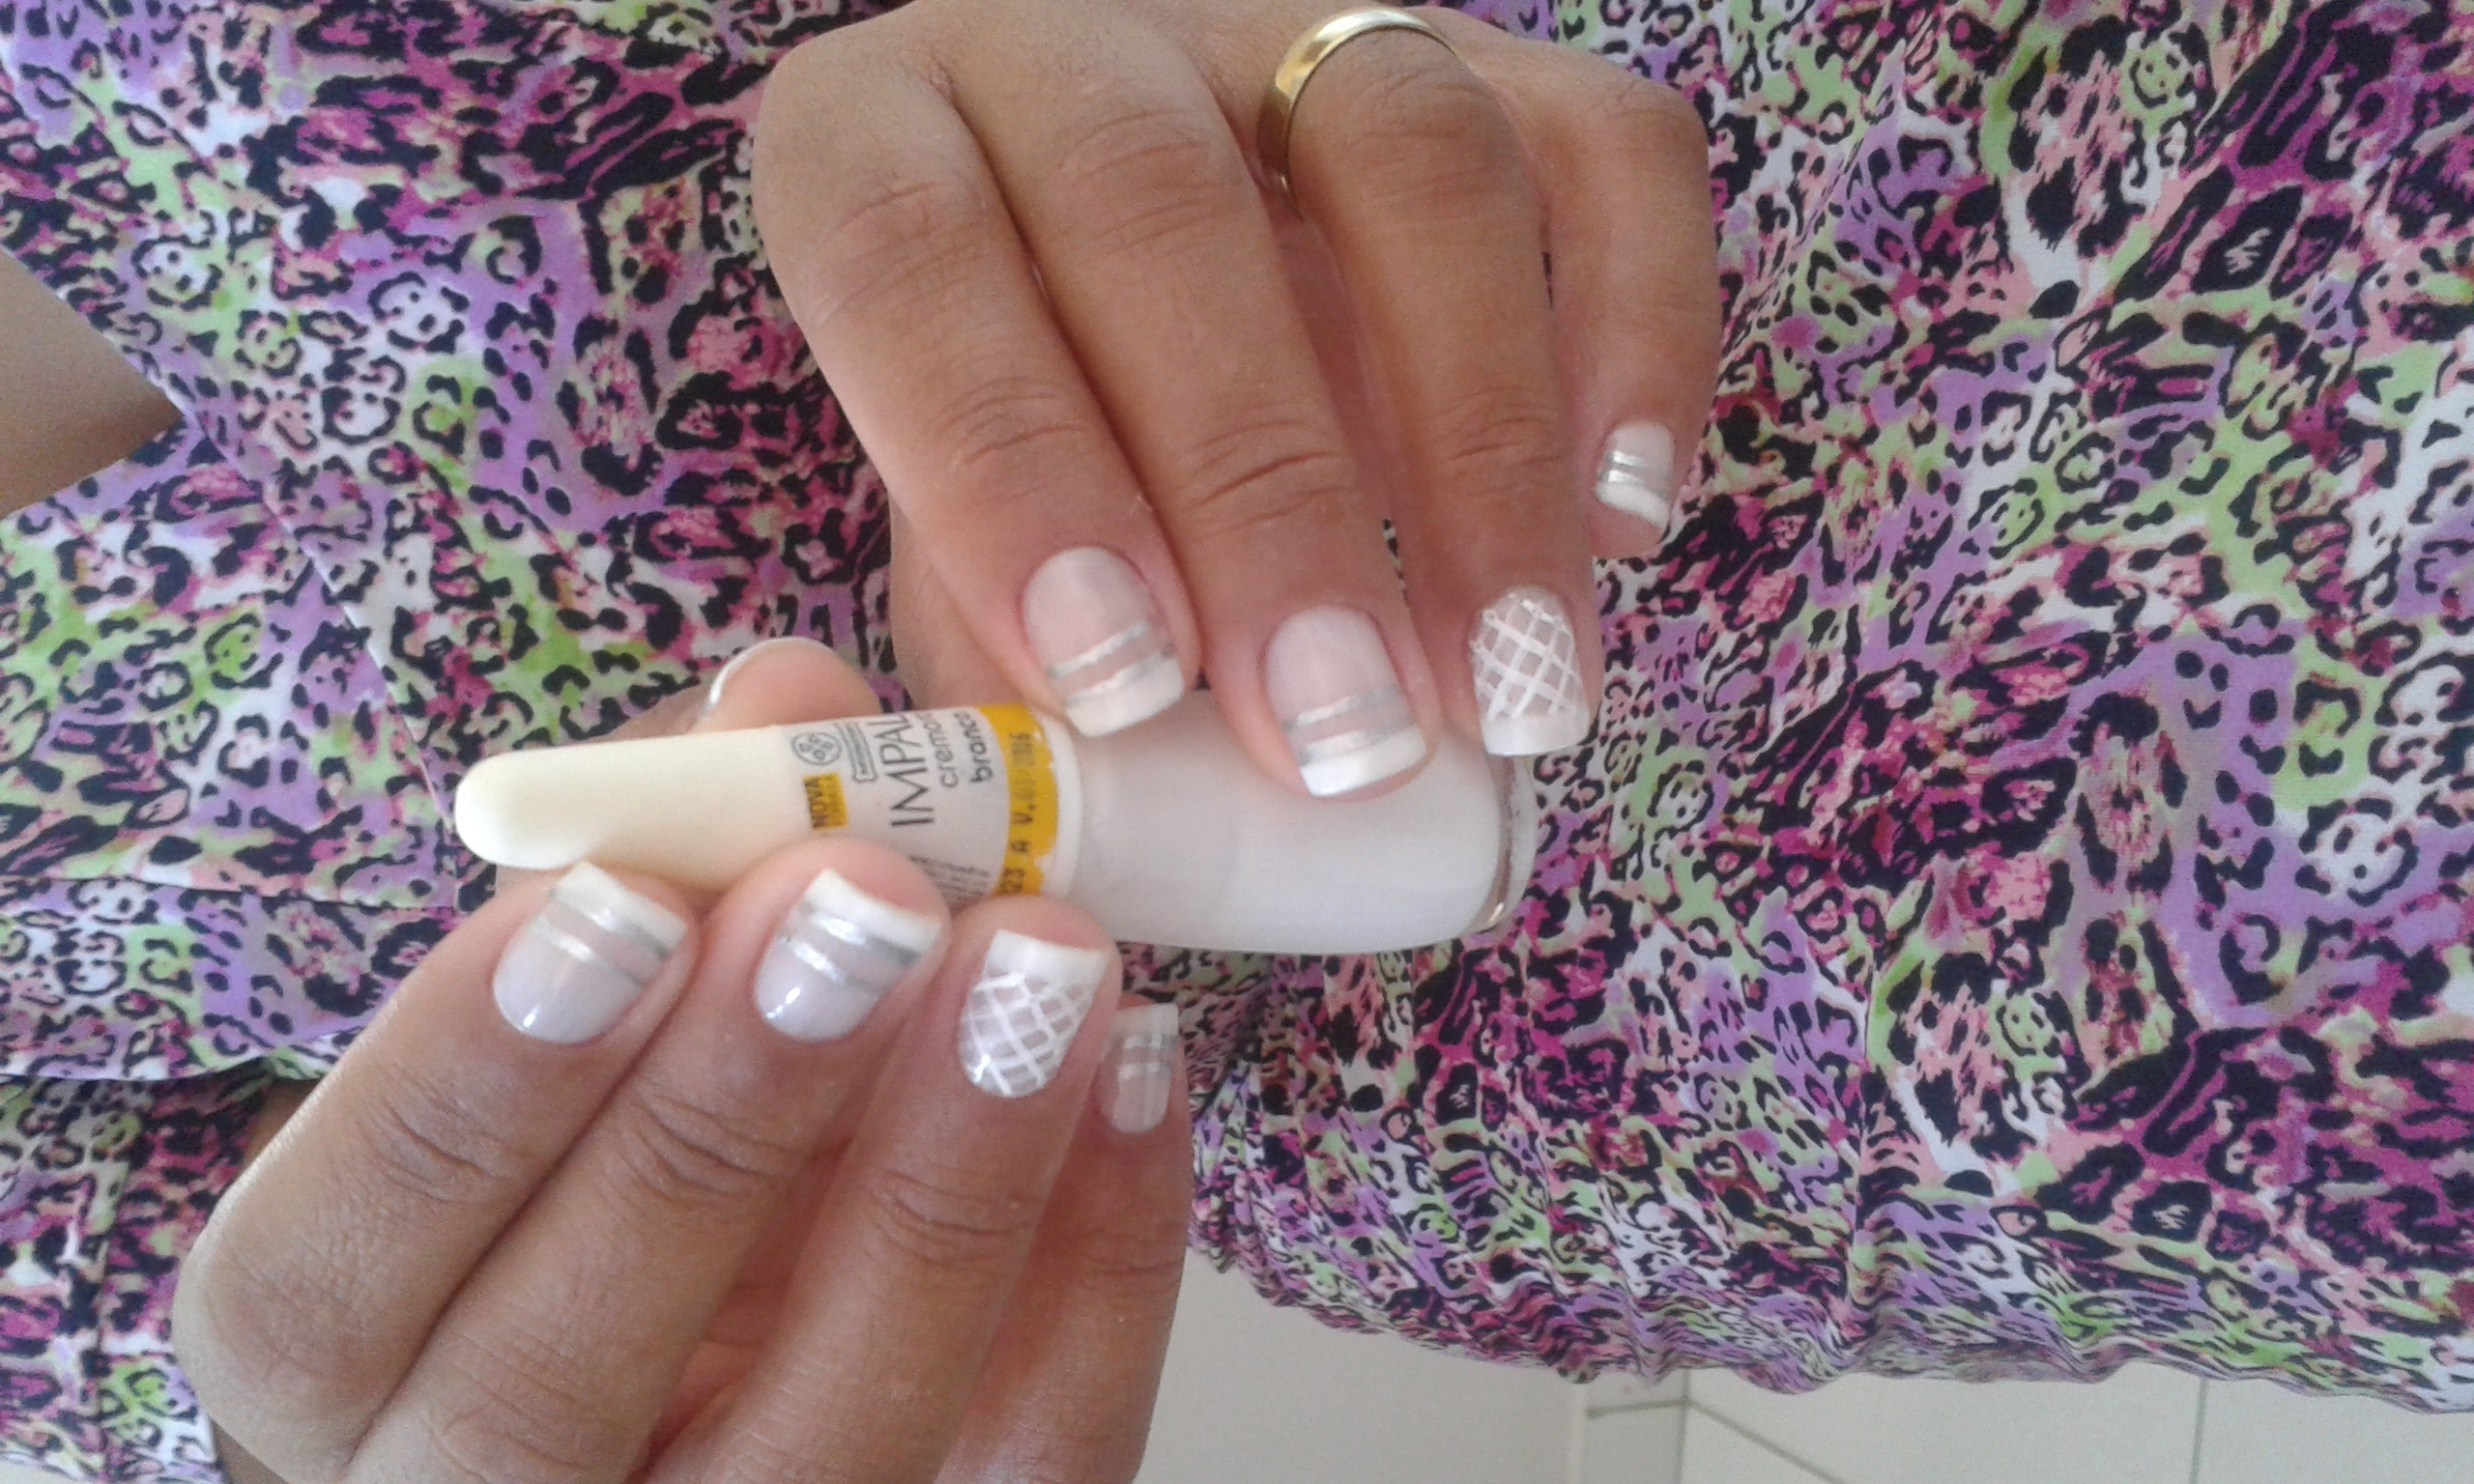 francesinha branca, básica, dia-a-dia unhas  manicure e pedicure manicure e pedicure